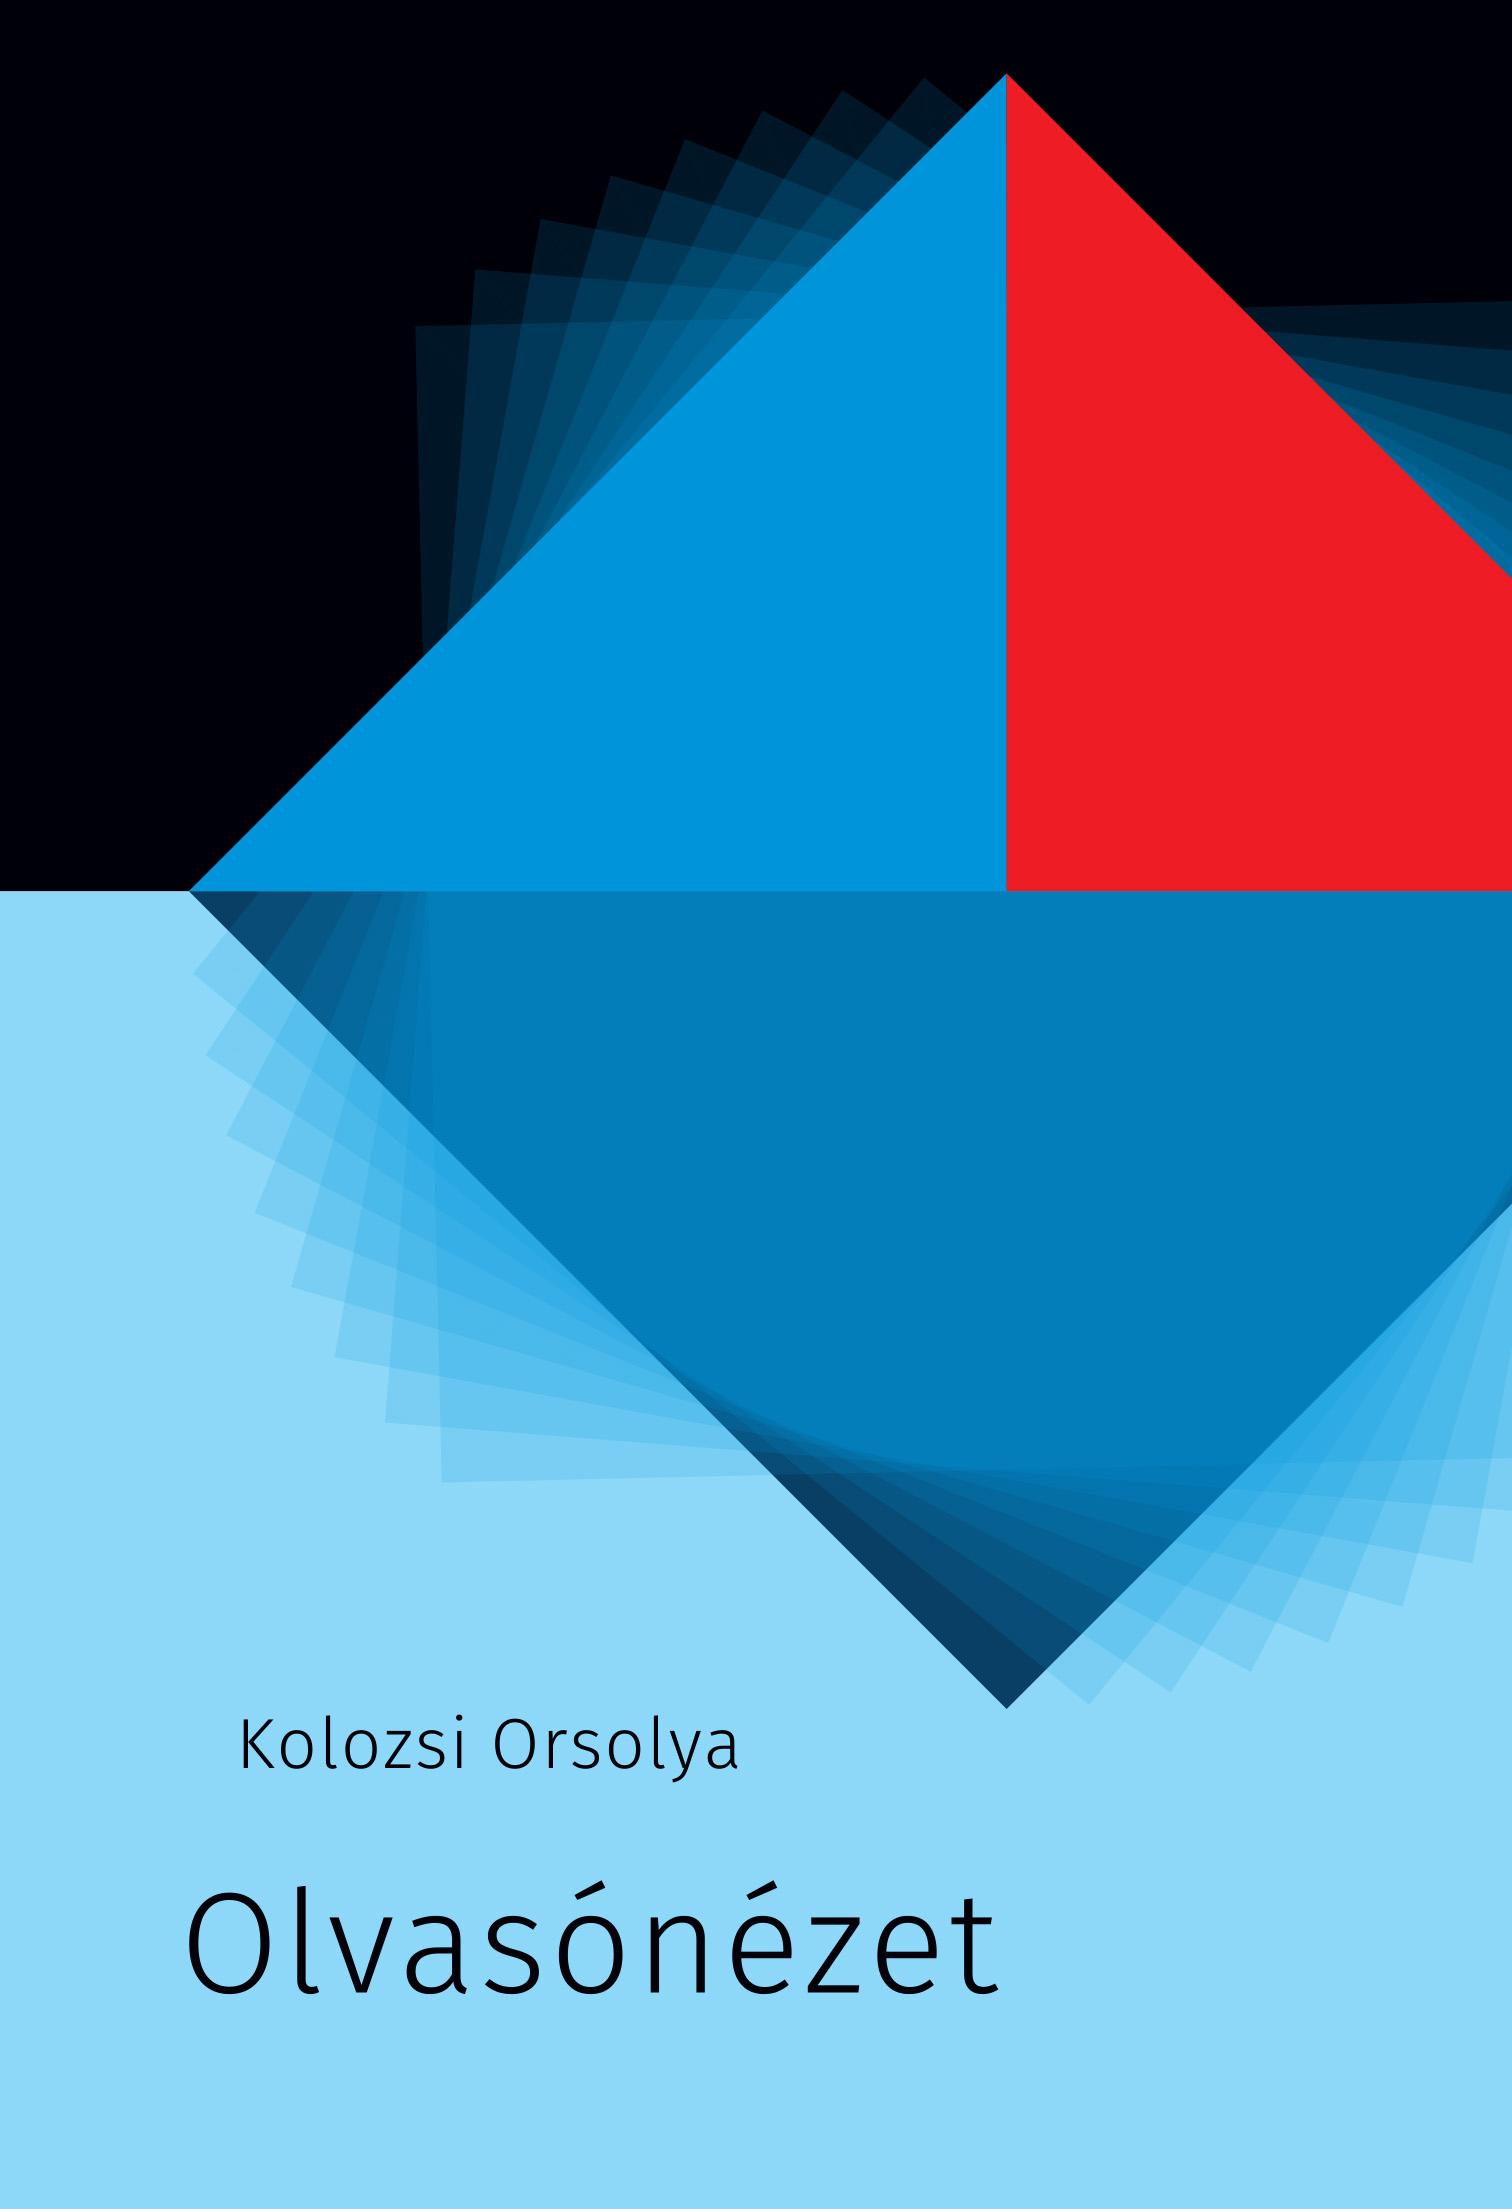 Kolozsi Orsolya - Olvasónézet